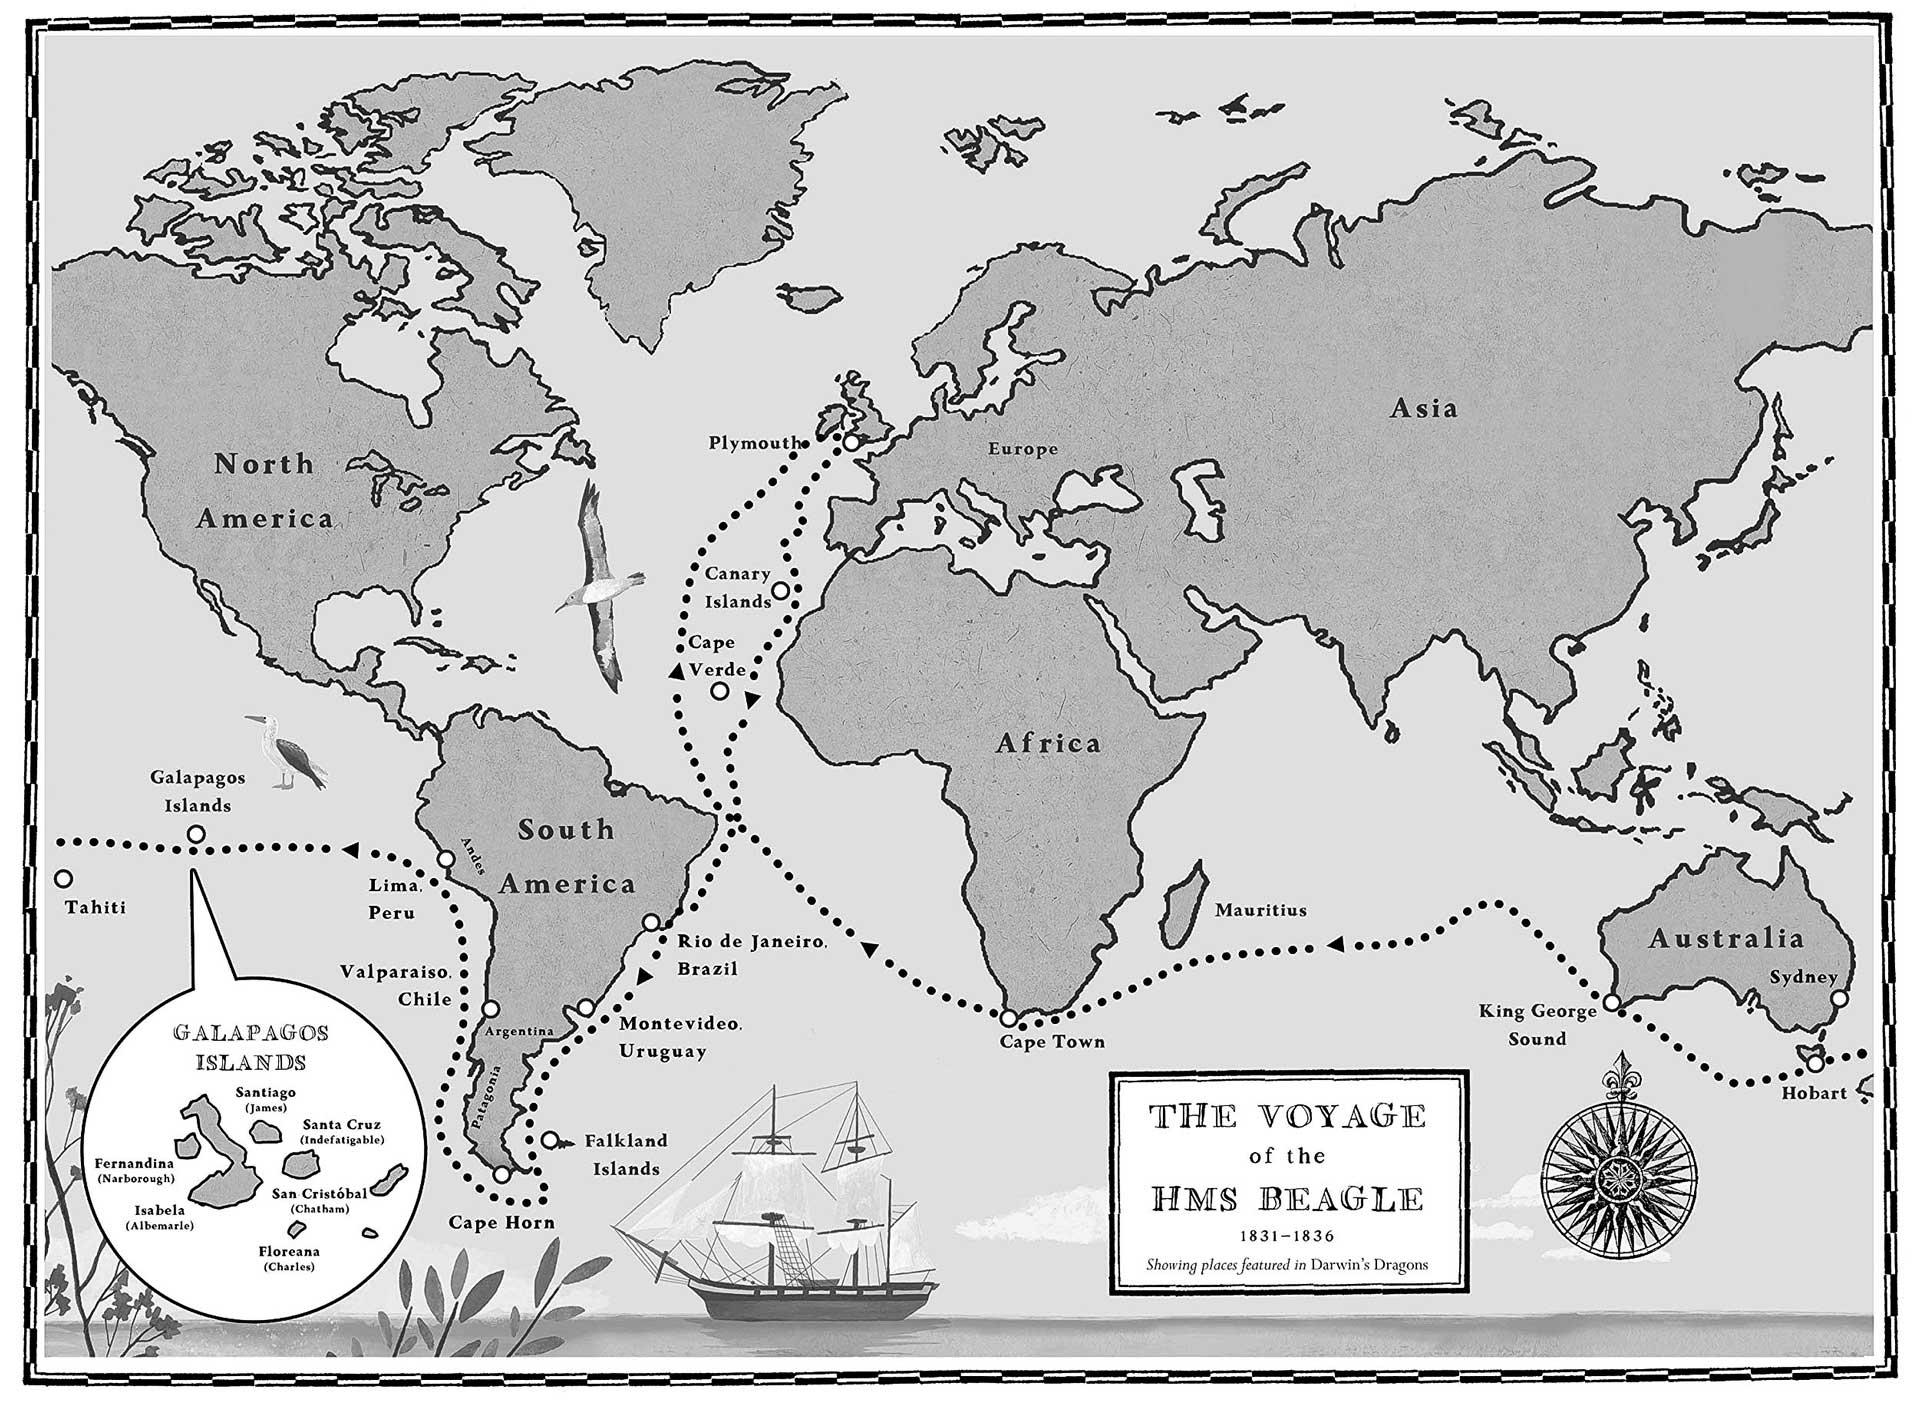 Darwin's Dragons map